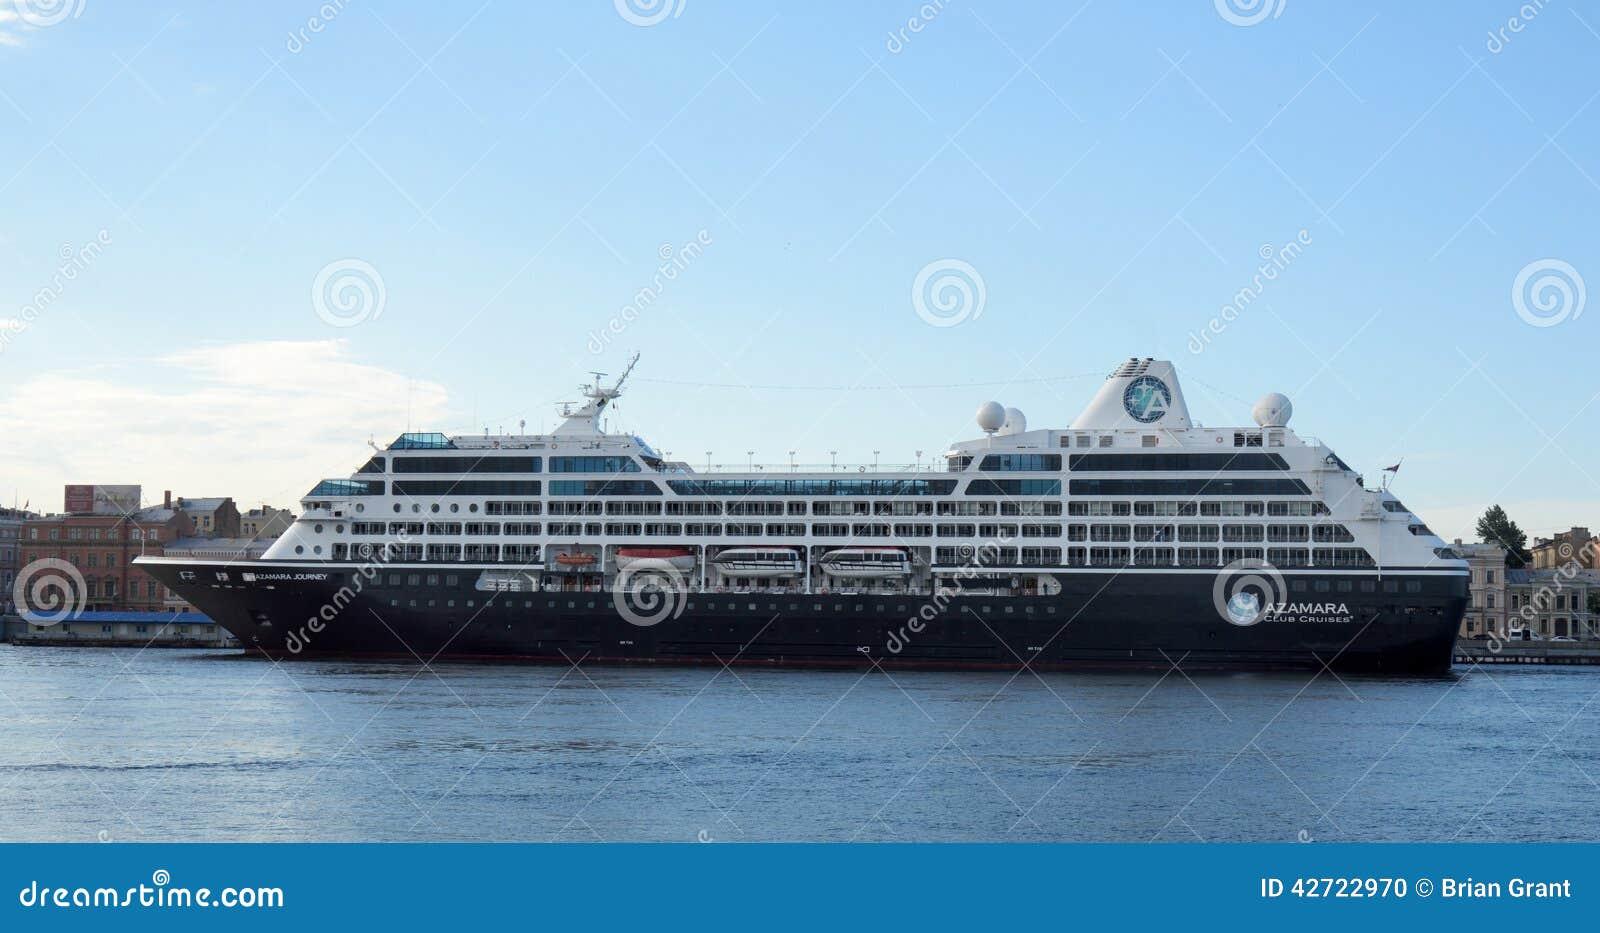 Cruise Ship Azamara Journey In St Petersburg Editorial